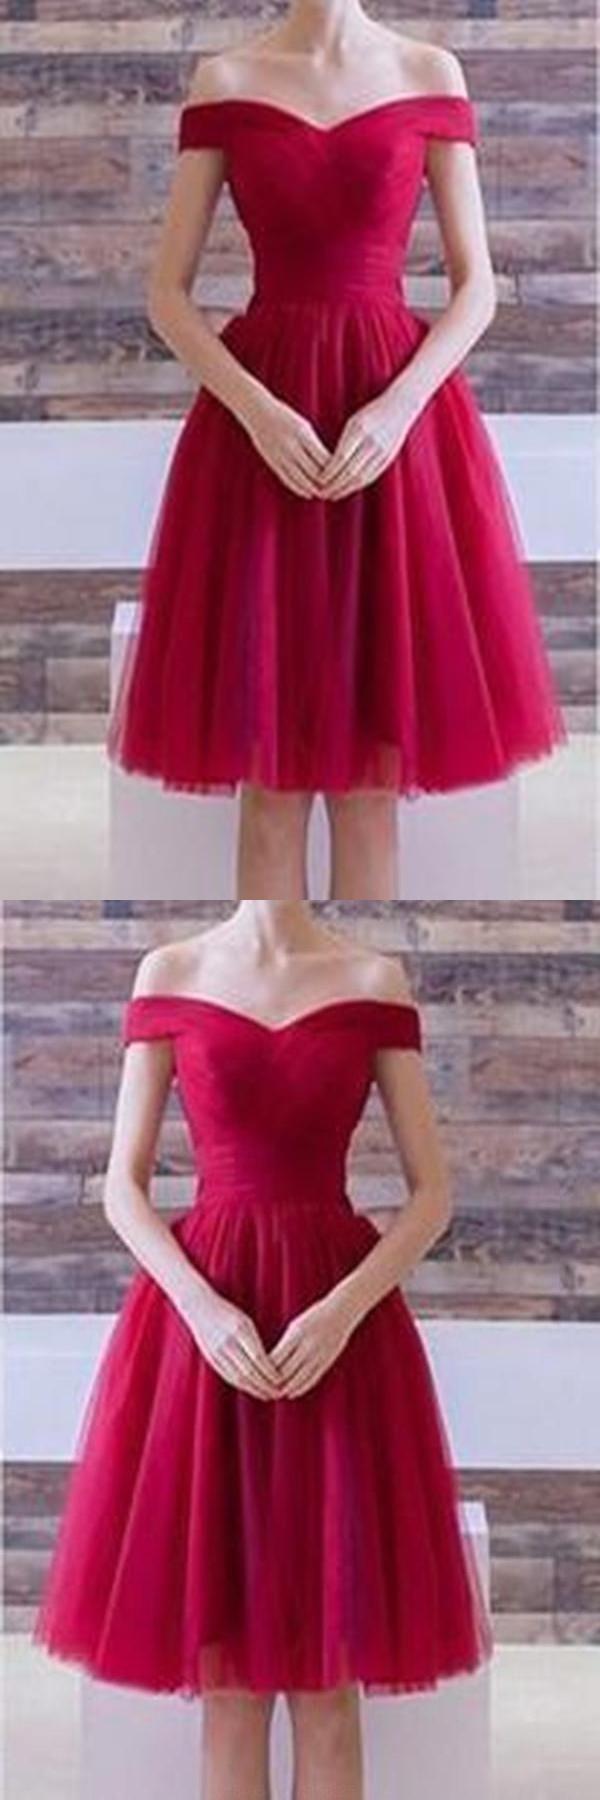 Luxurious prom dresses short burgundy prom dresses in